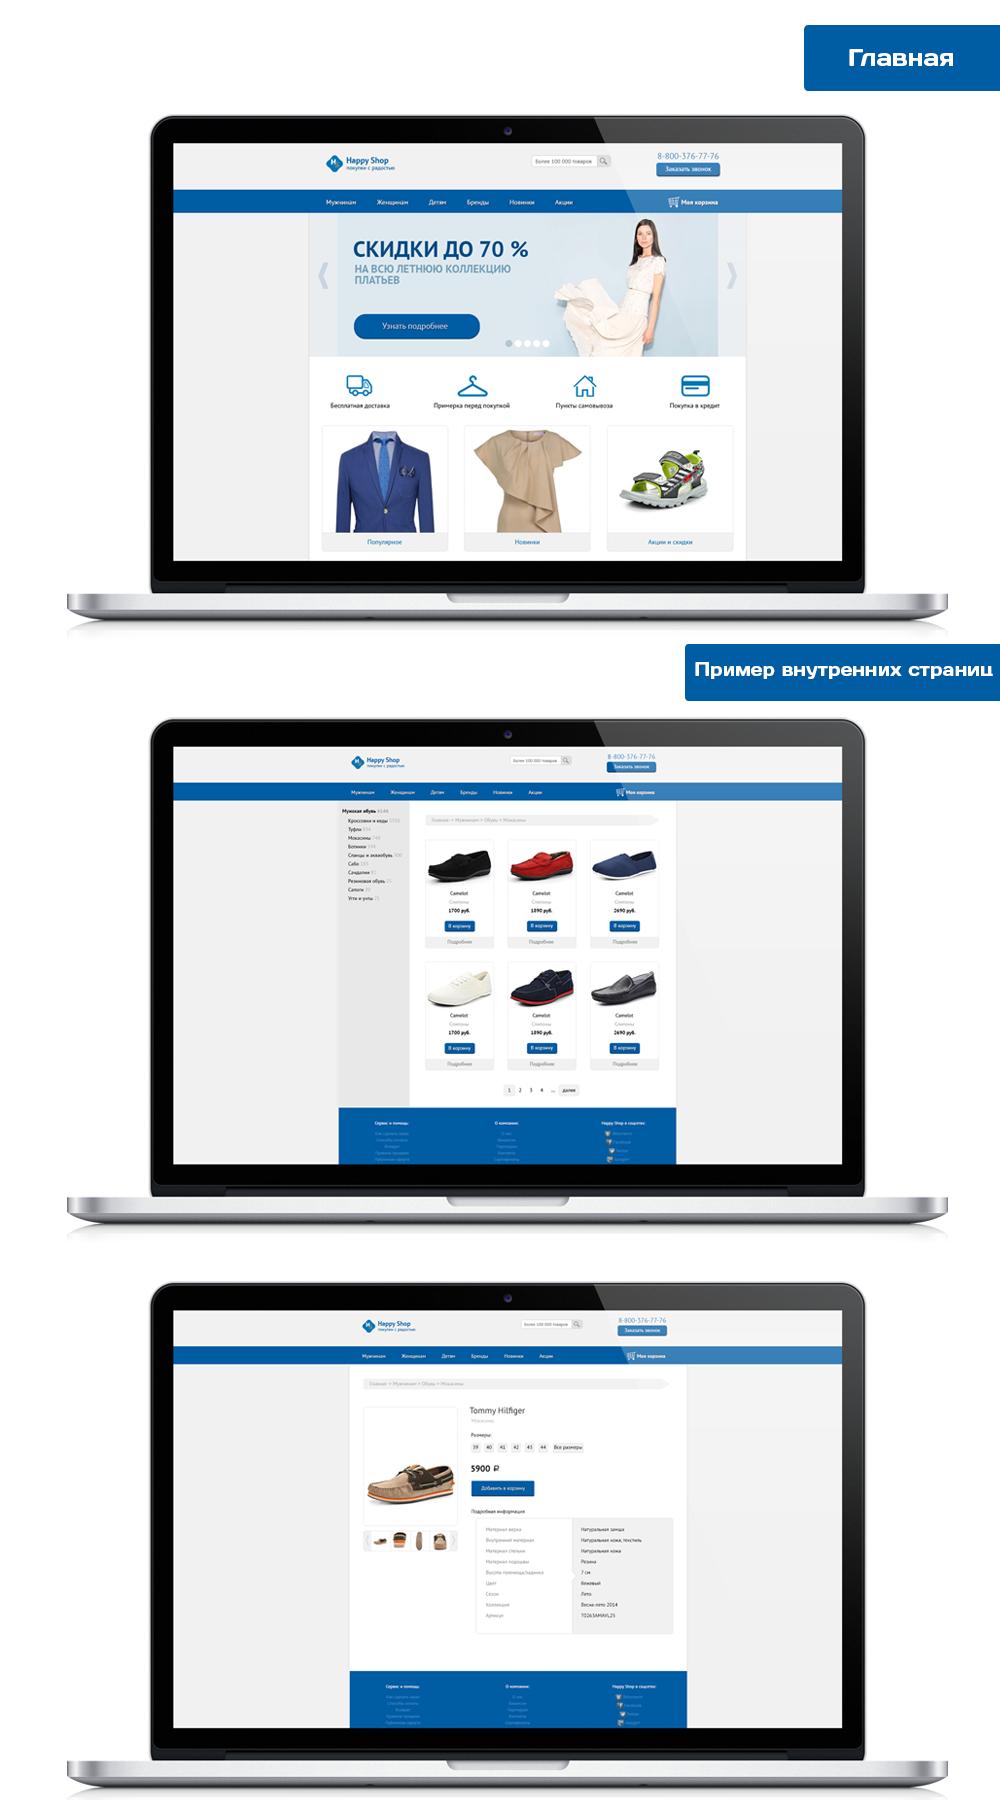 Дизайн интернет-магазина (минимализм)